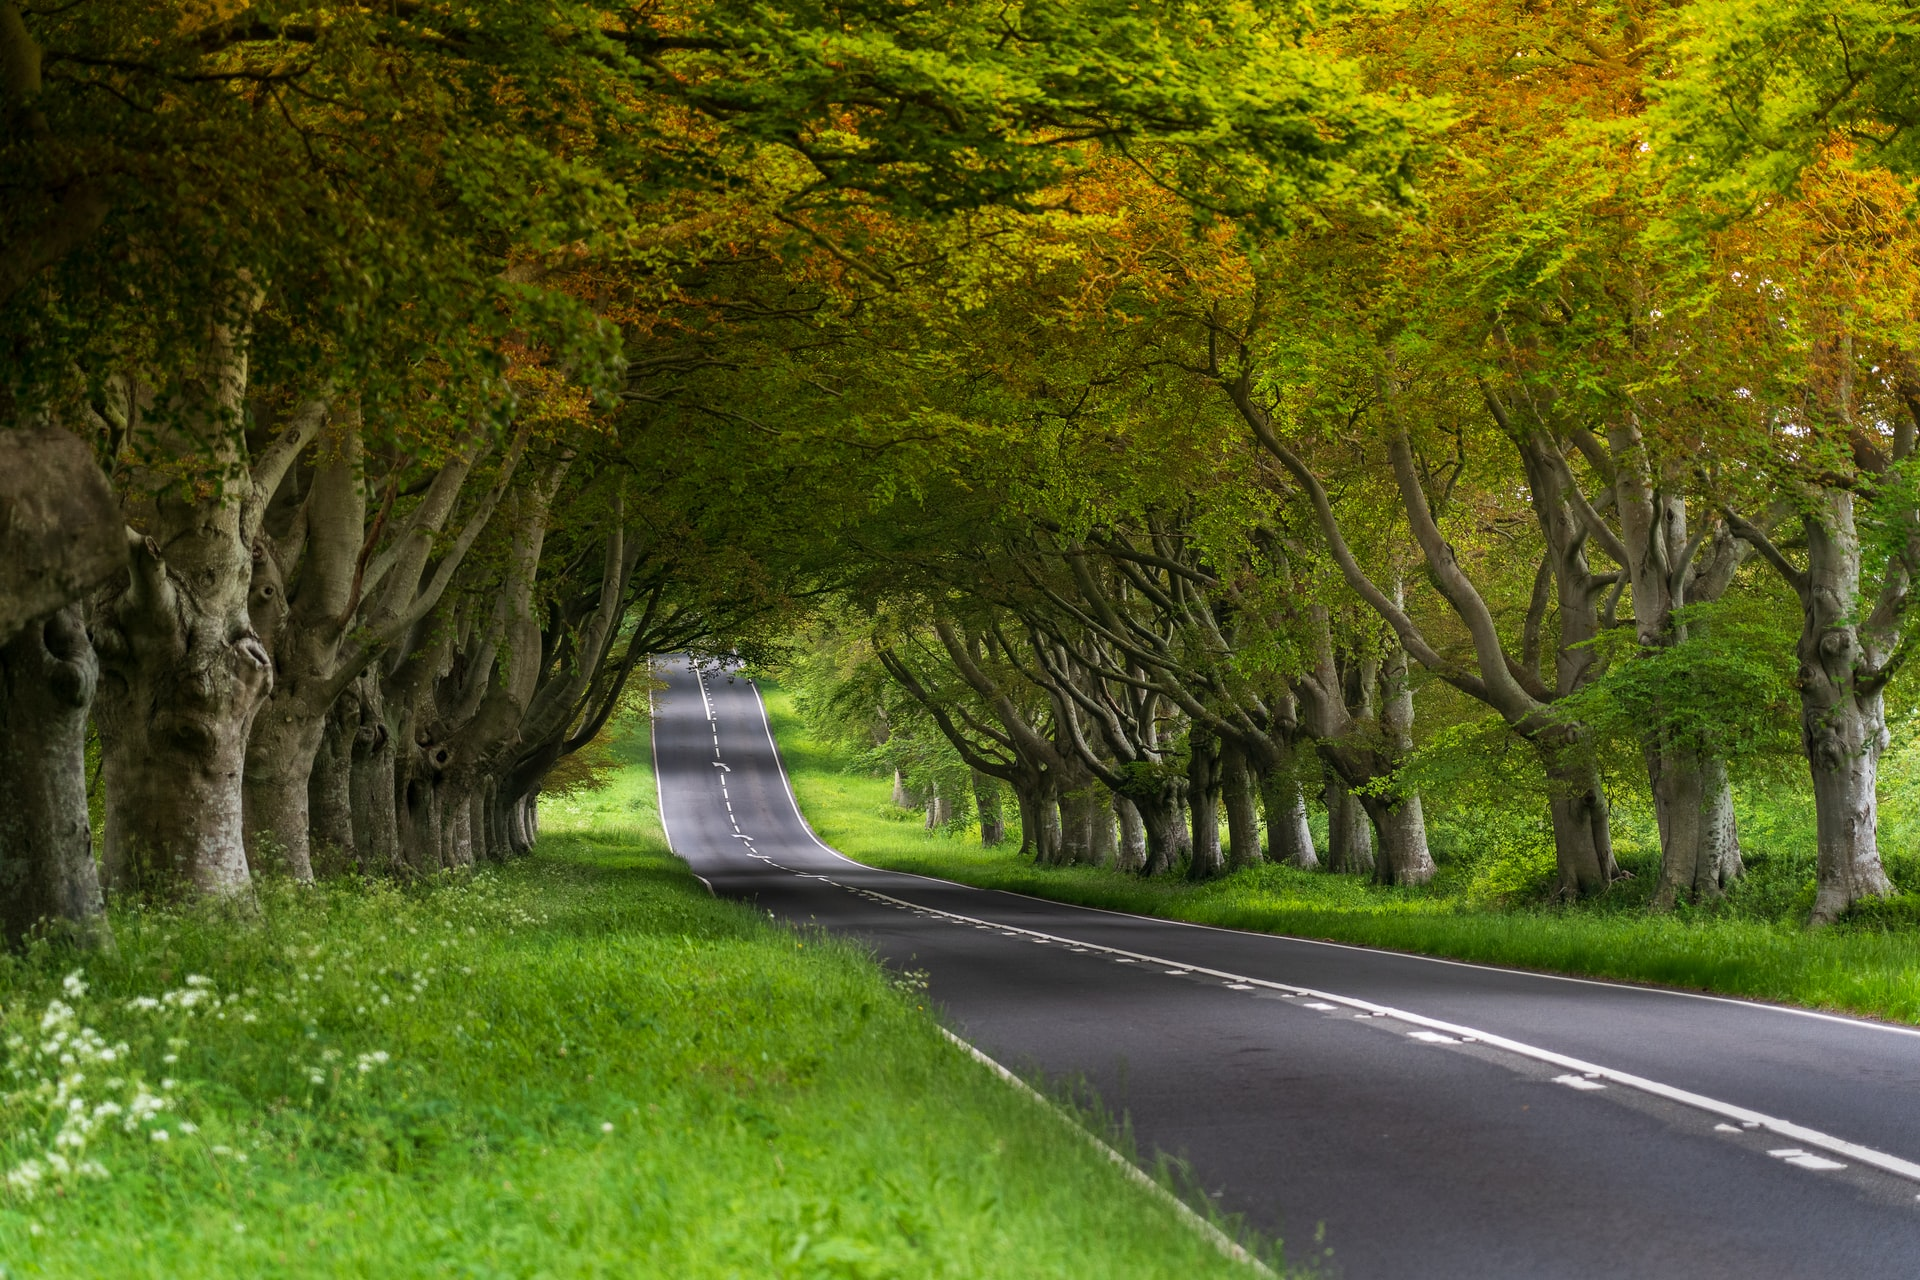 Kingston Lacy autumn